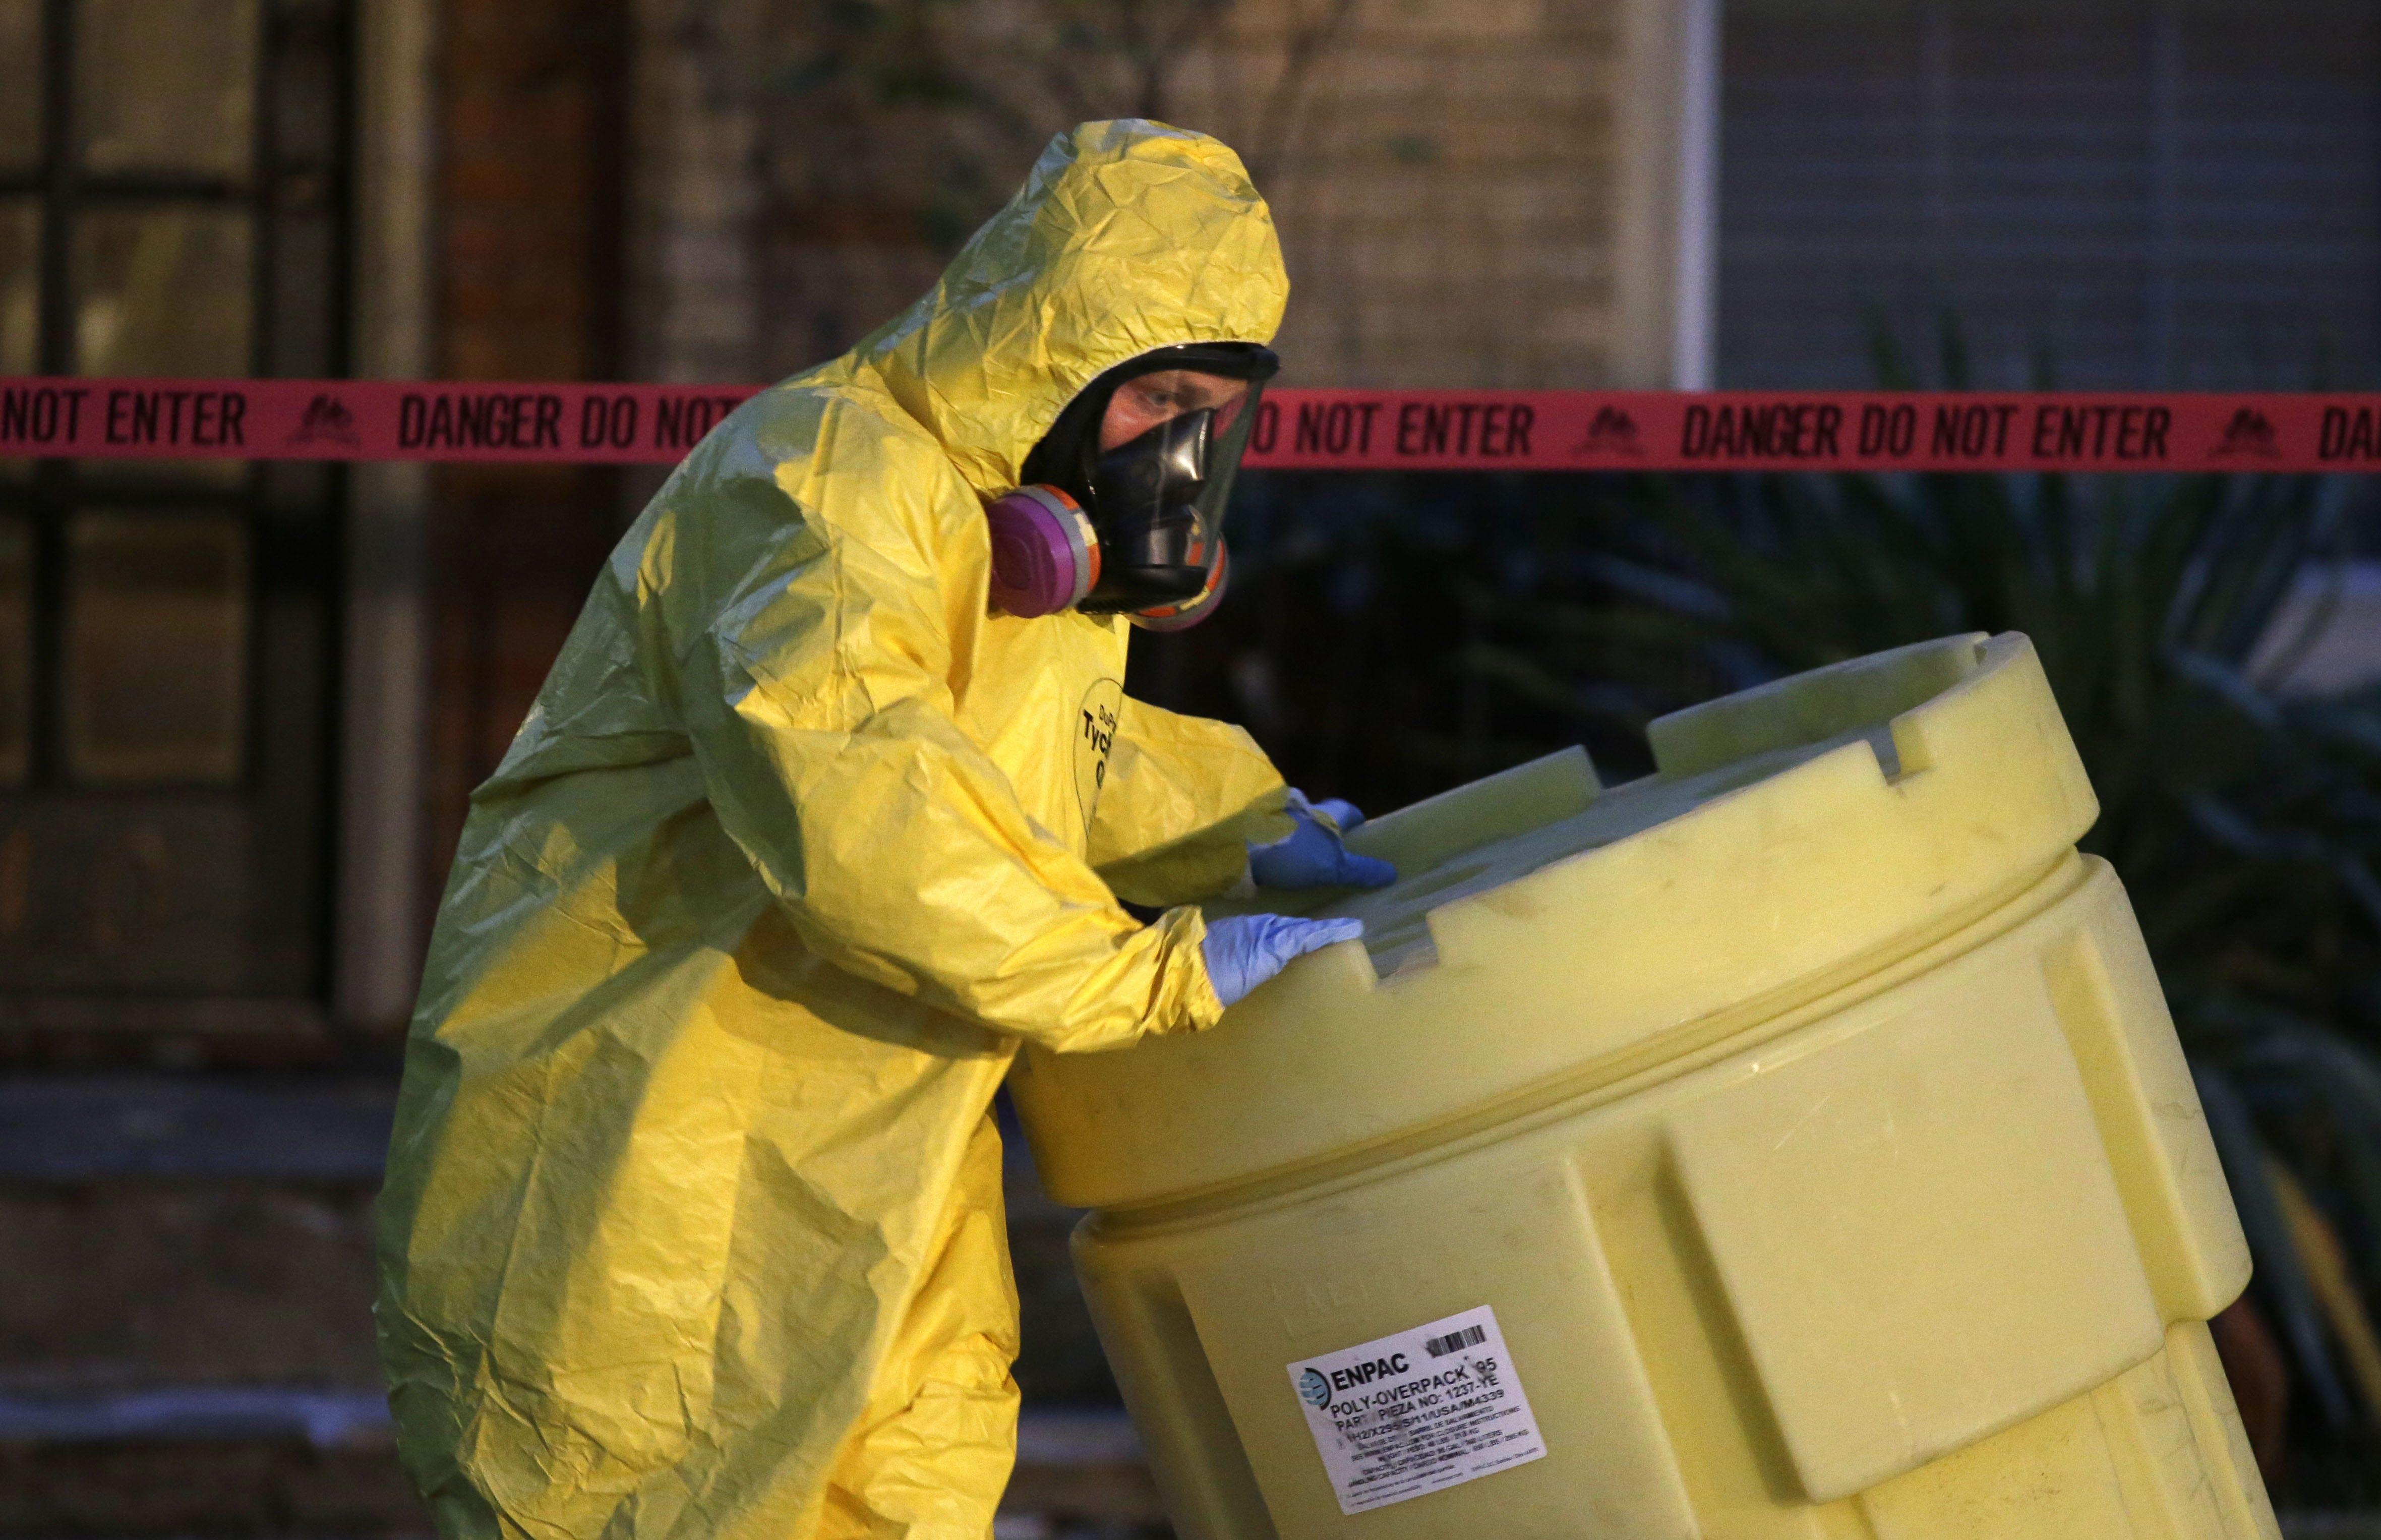 Toxic mess: Agencies at odds over Ebola-waste disposal